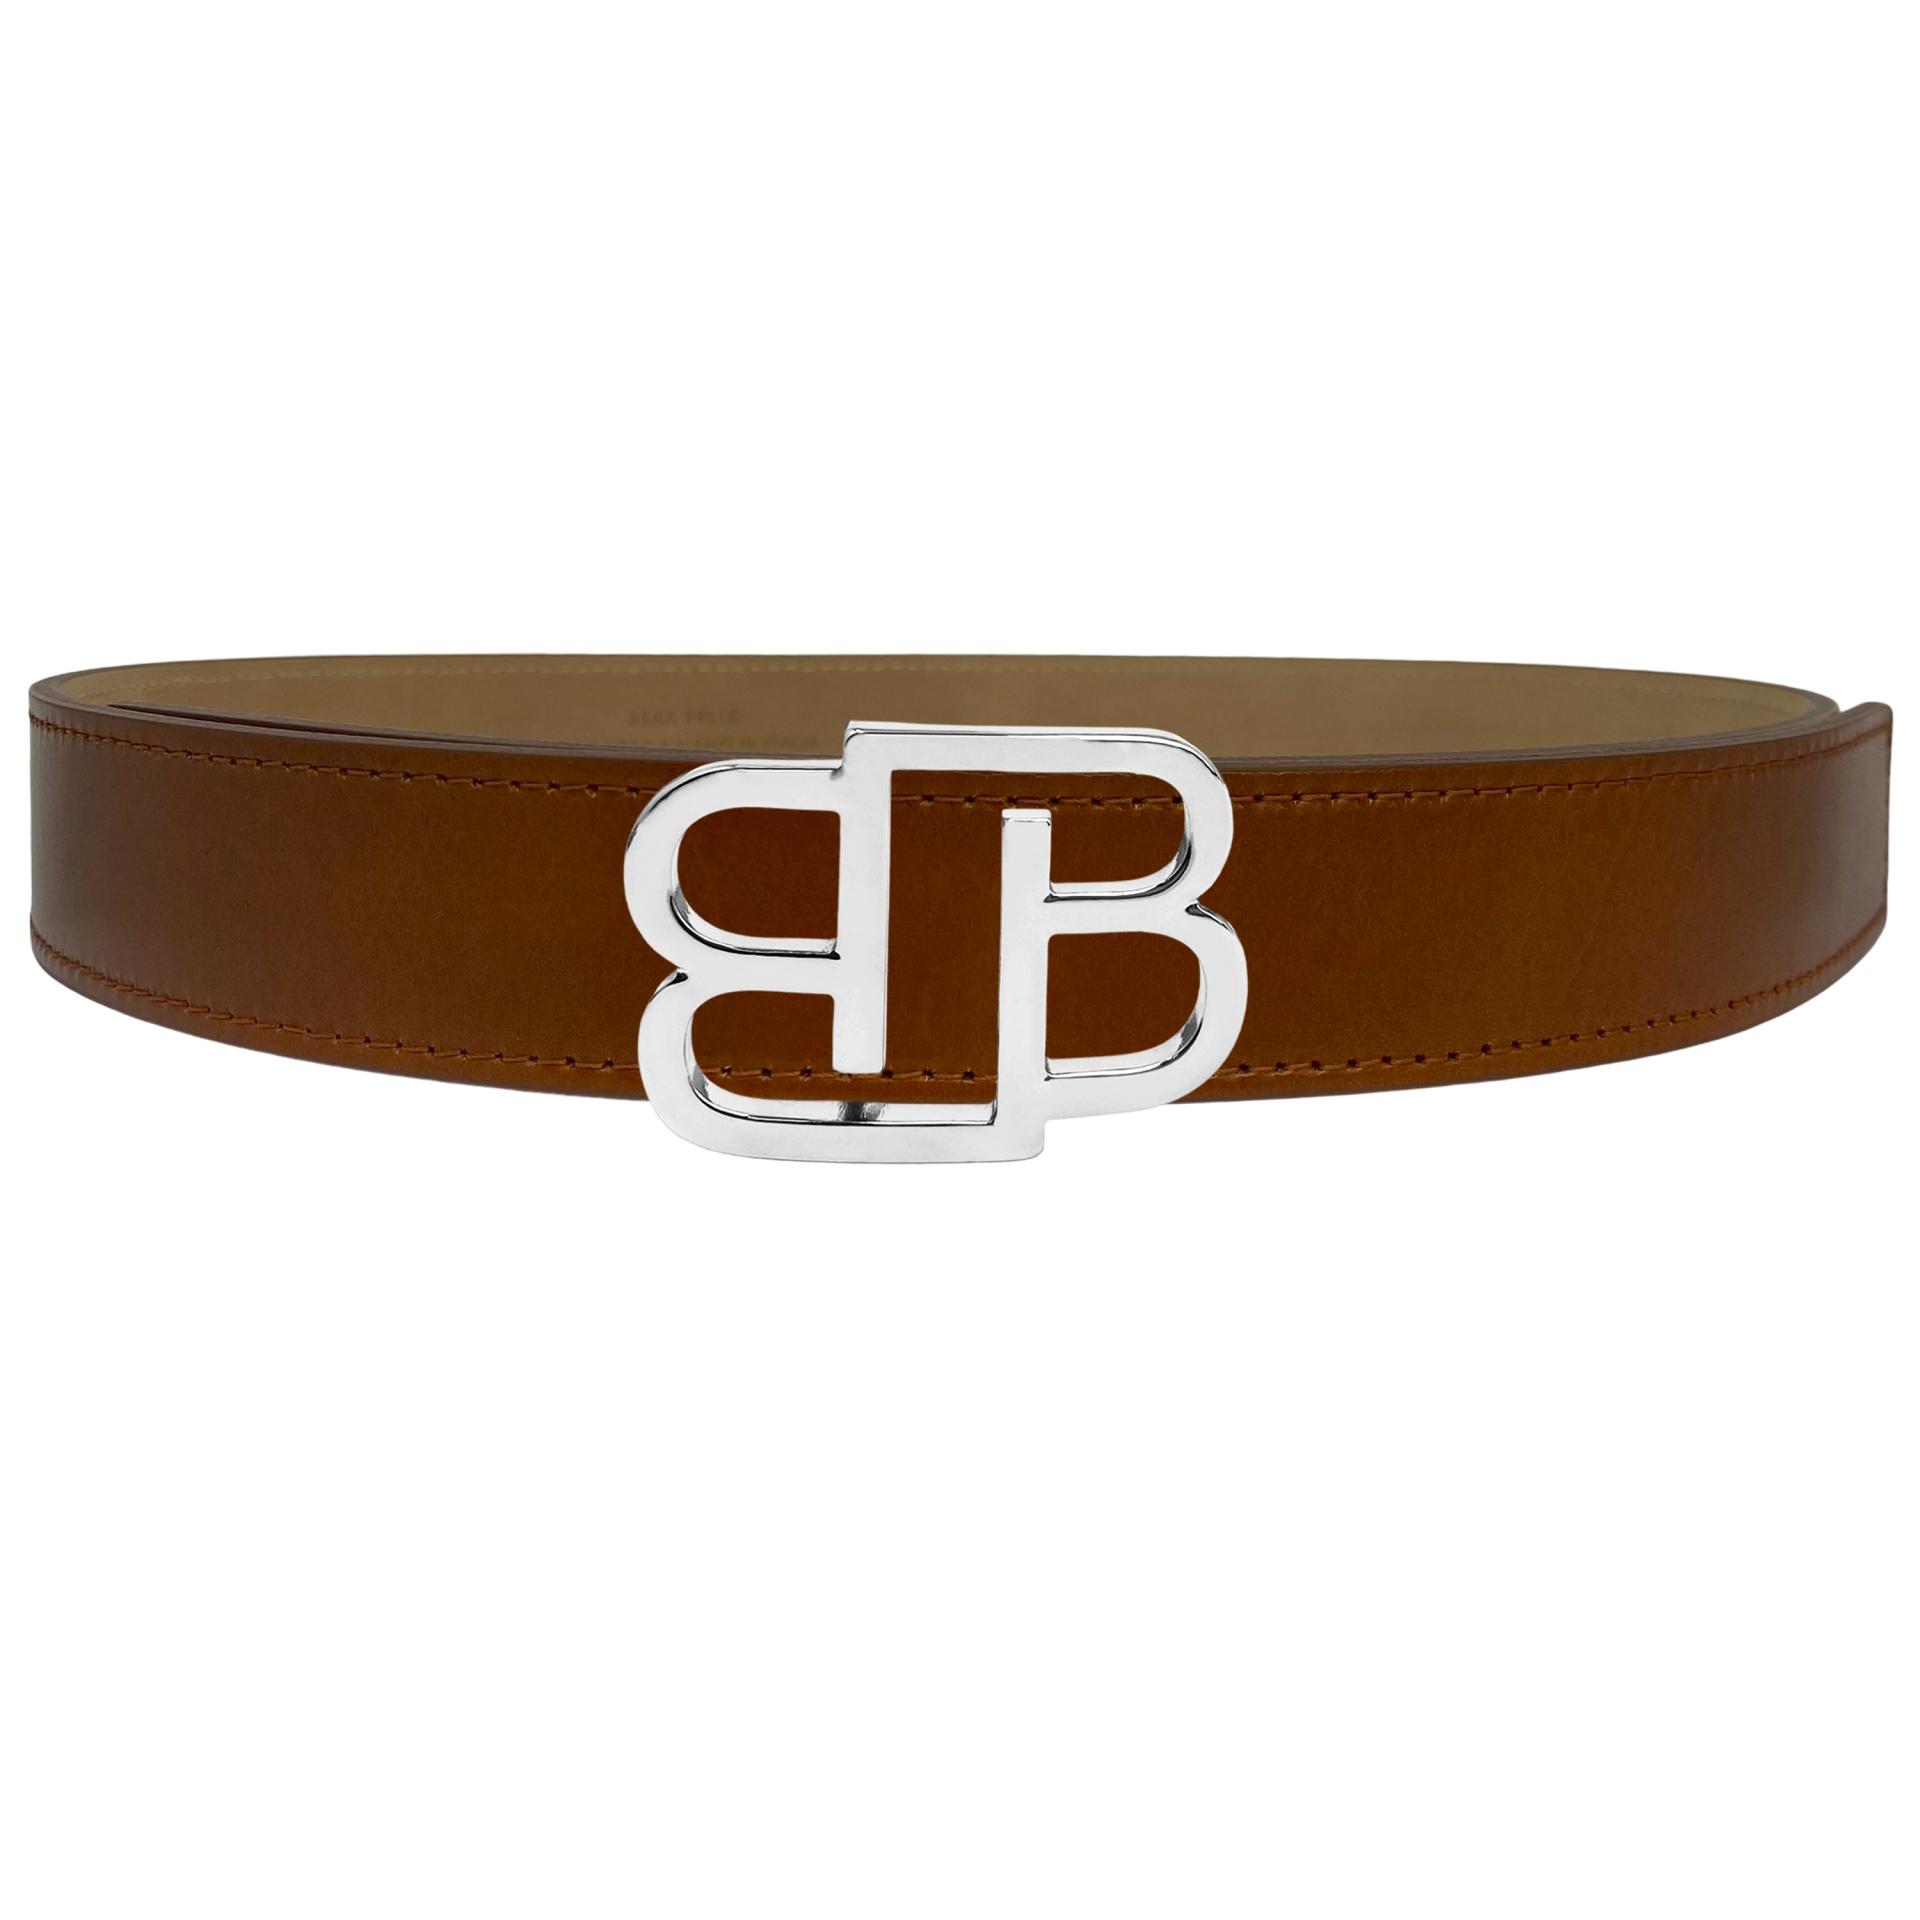 Genuine leather belt with BB nickel free buckle, brown